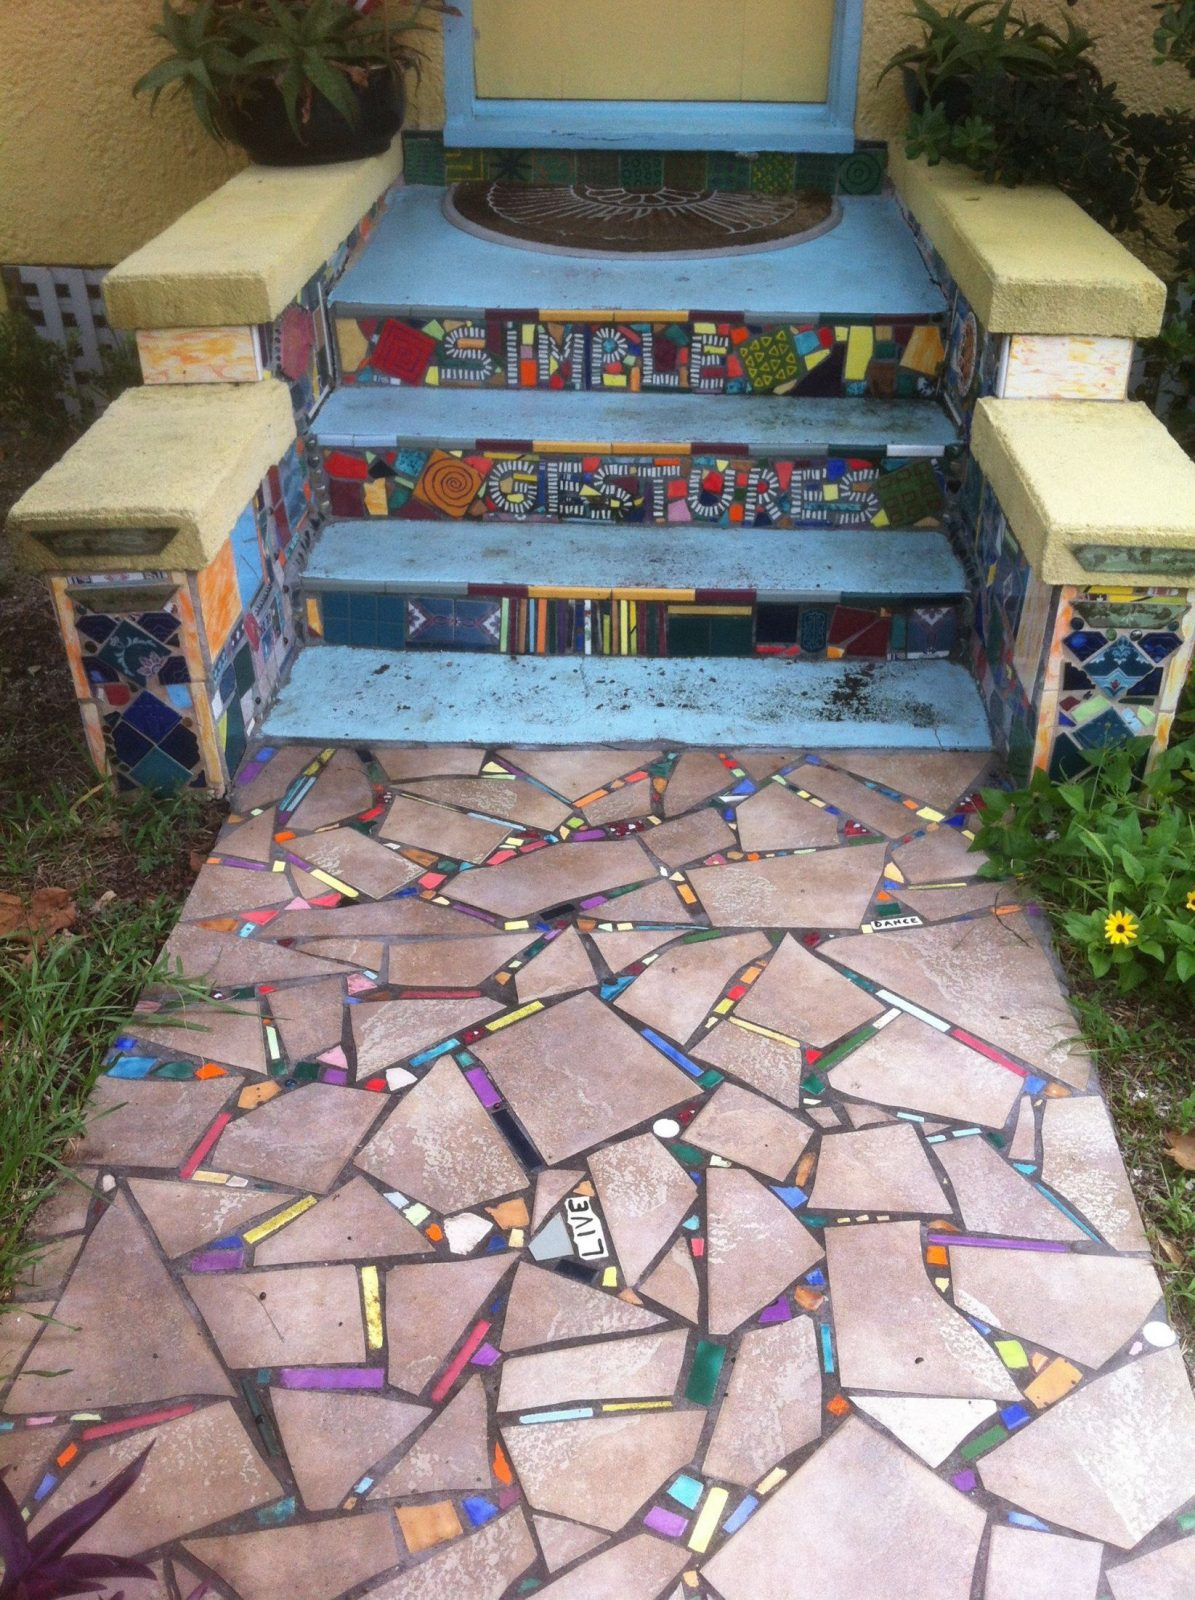 Toll Selber Machen  Mosaik  Pinterest  Selber Machen Mosaik von Mosaik Im Garten Selber Machen Photo